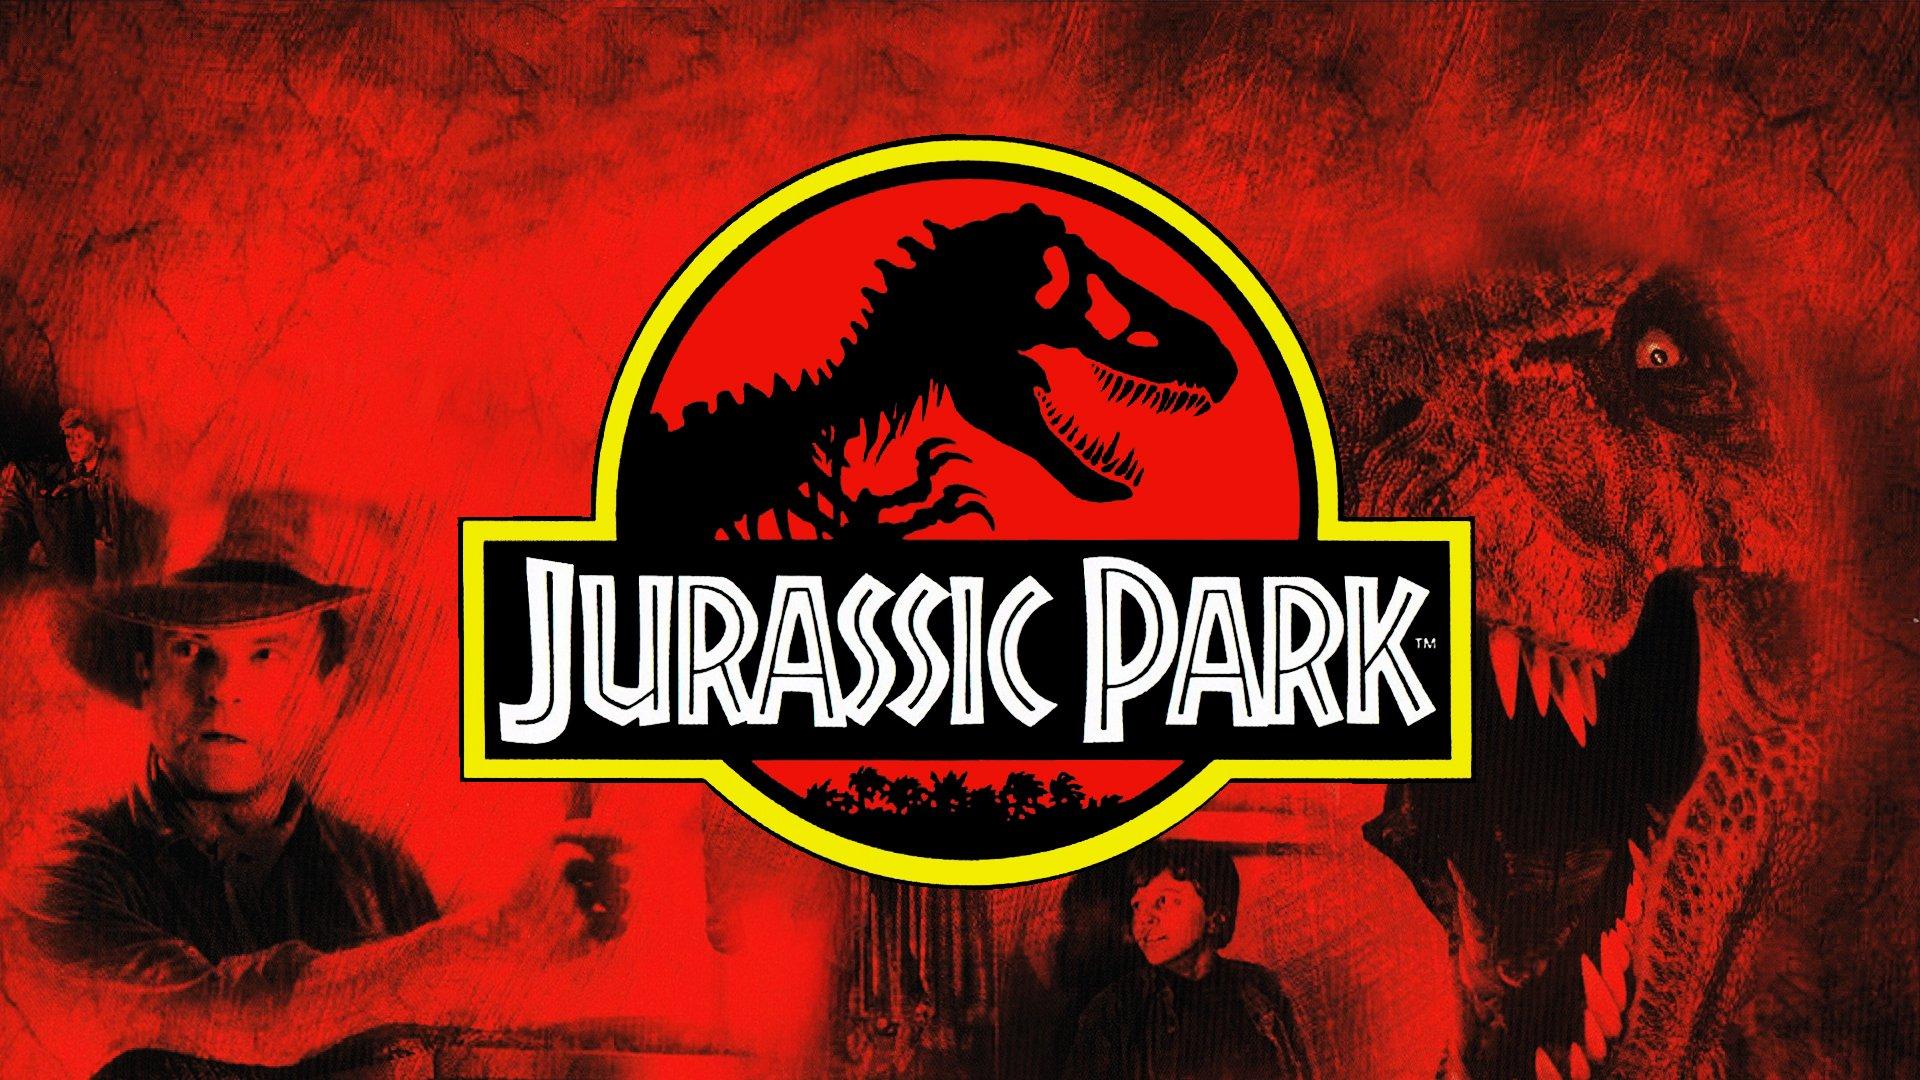 Jurassic Park 3 Poster - wallpaper